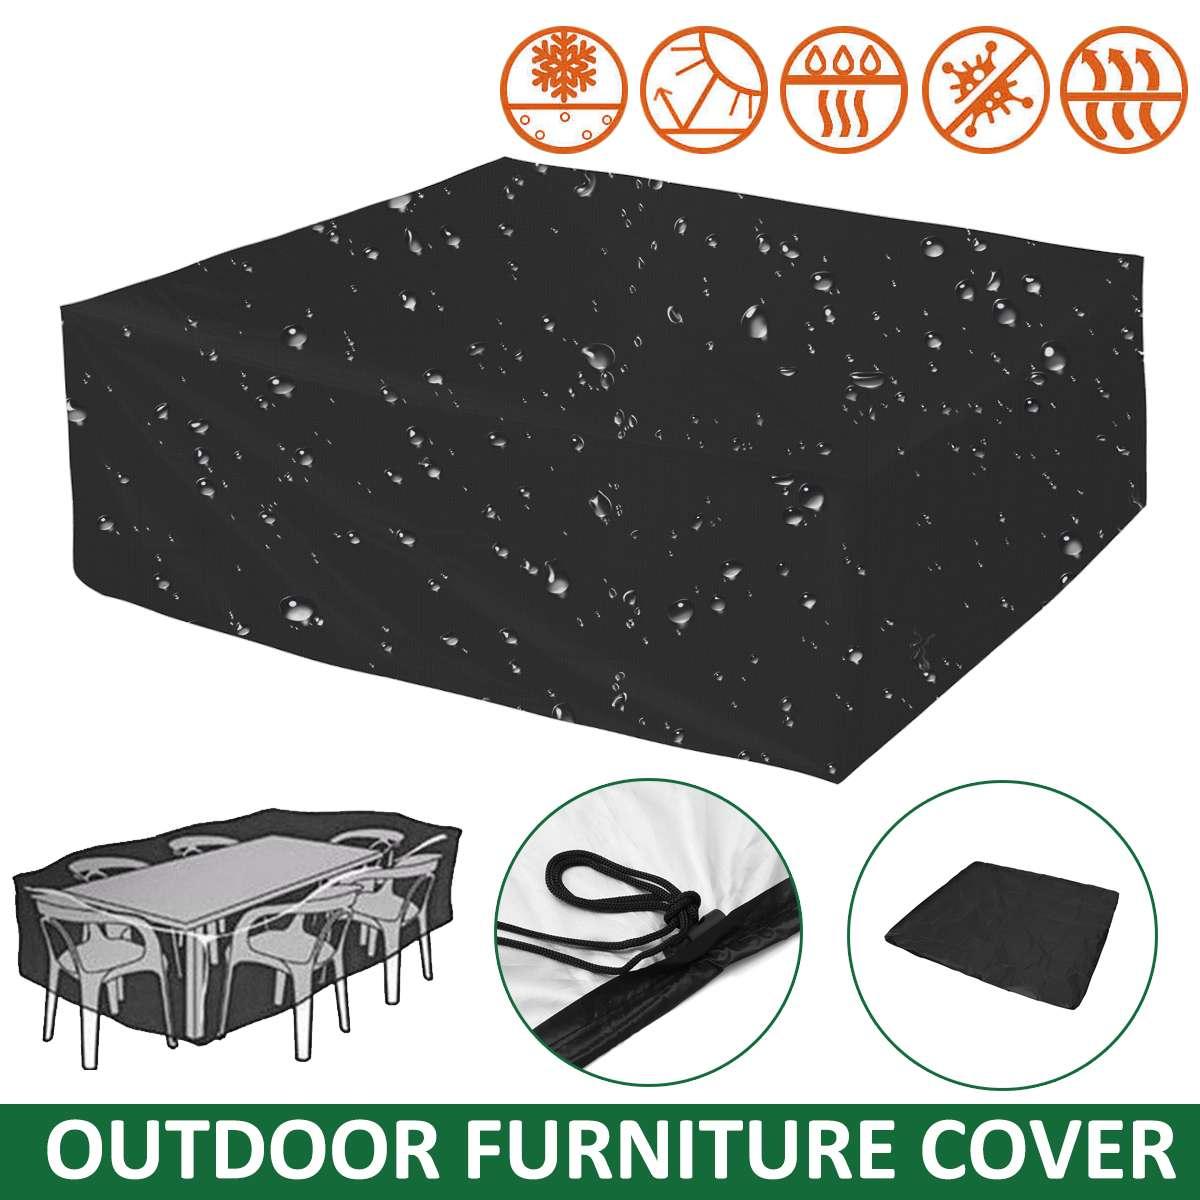 Net 2 Maten Outdoor Meubilair Tuinmeubelen Waterdicht Protector Regen Sneeuw Stoel Stofkap Tafel Sofa All-purpose Cover